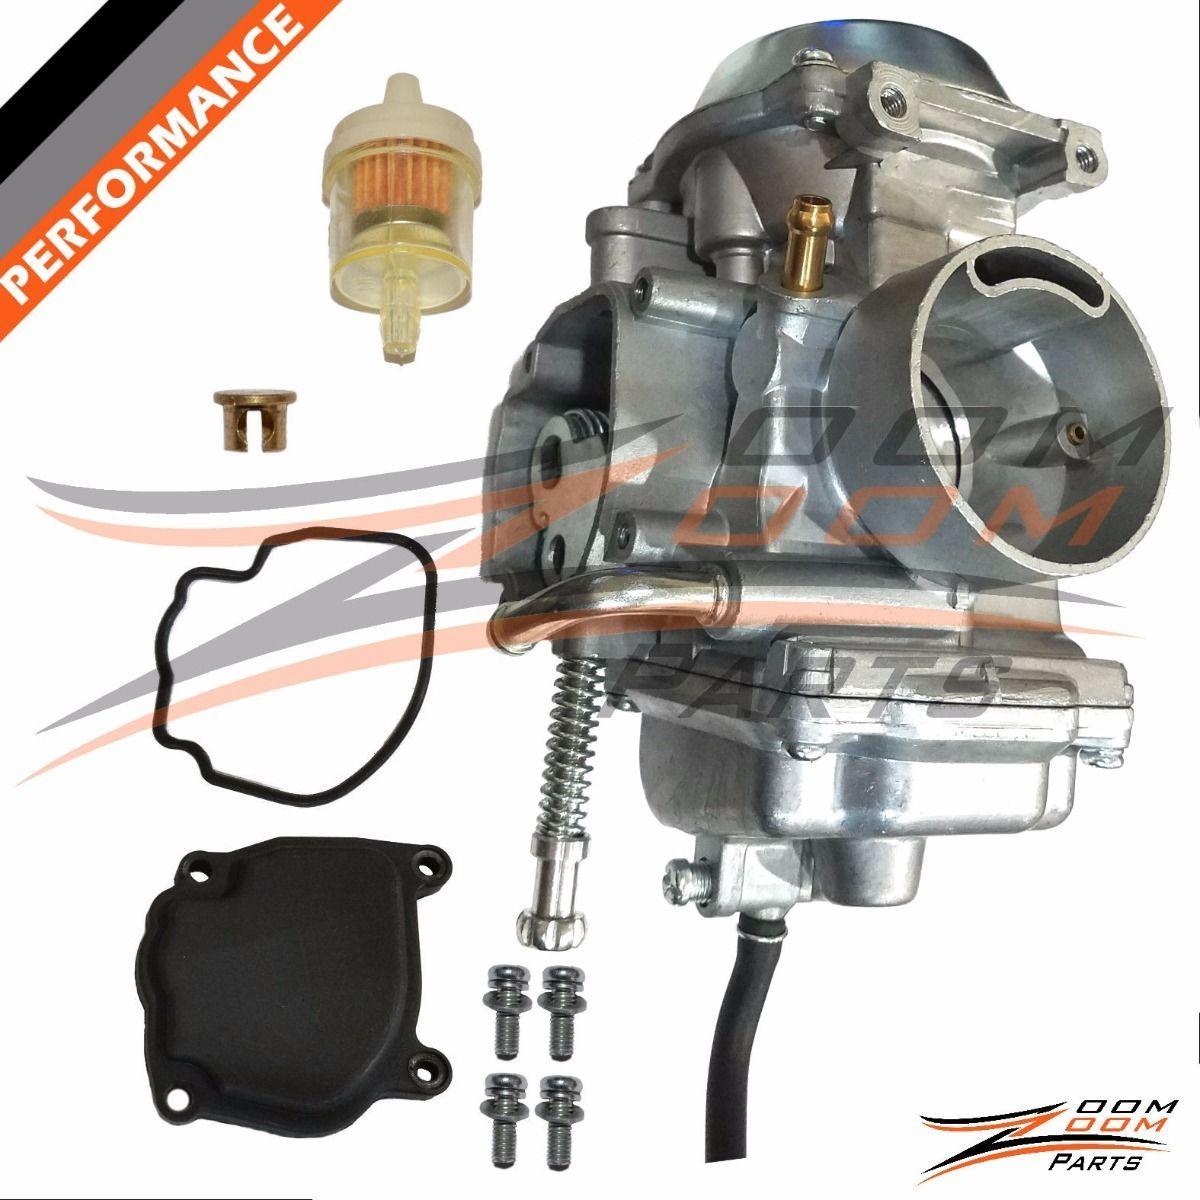 Carburetor Fits For Polaris Sportsman 600 2003-2005 Carb 03-06